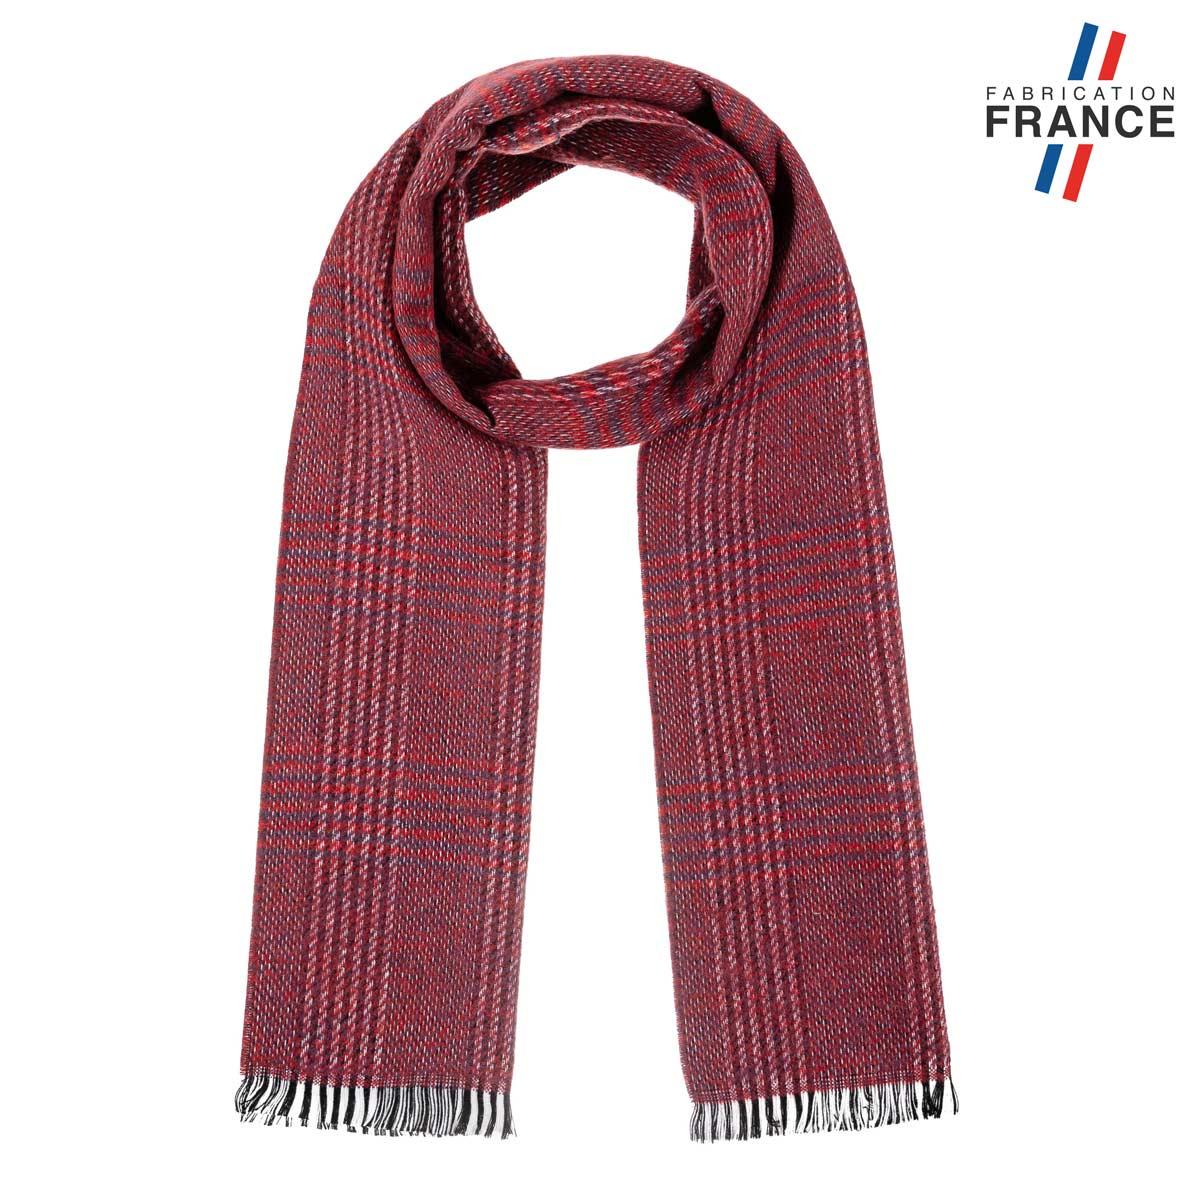 AT-06217-F12-LB_FR-echarpe-alpaga-pourpre-made-in-france